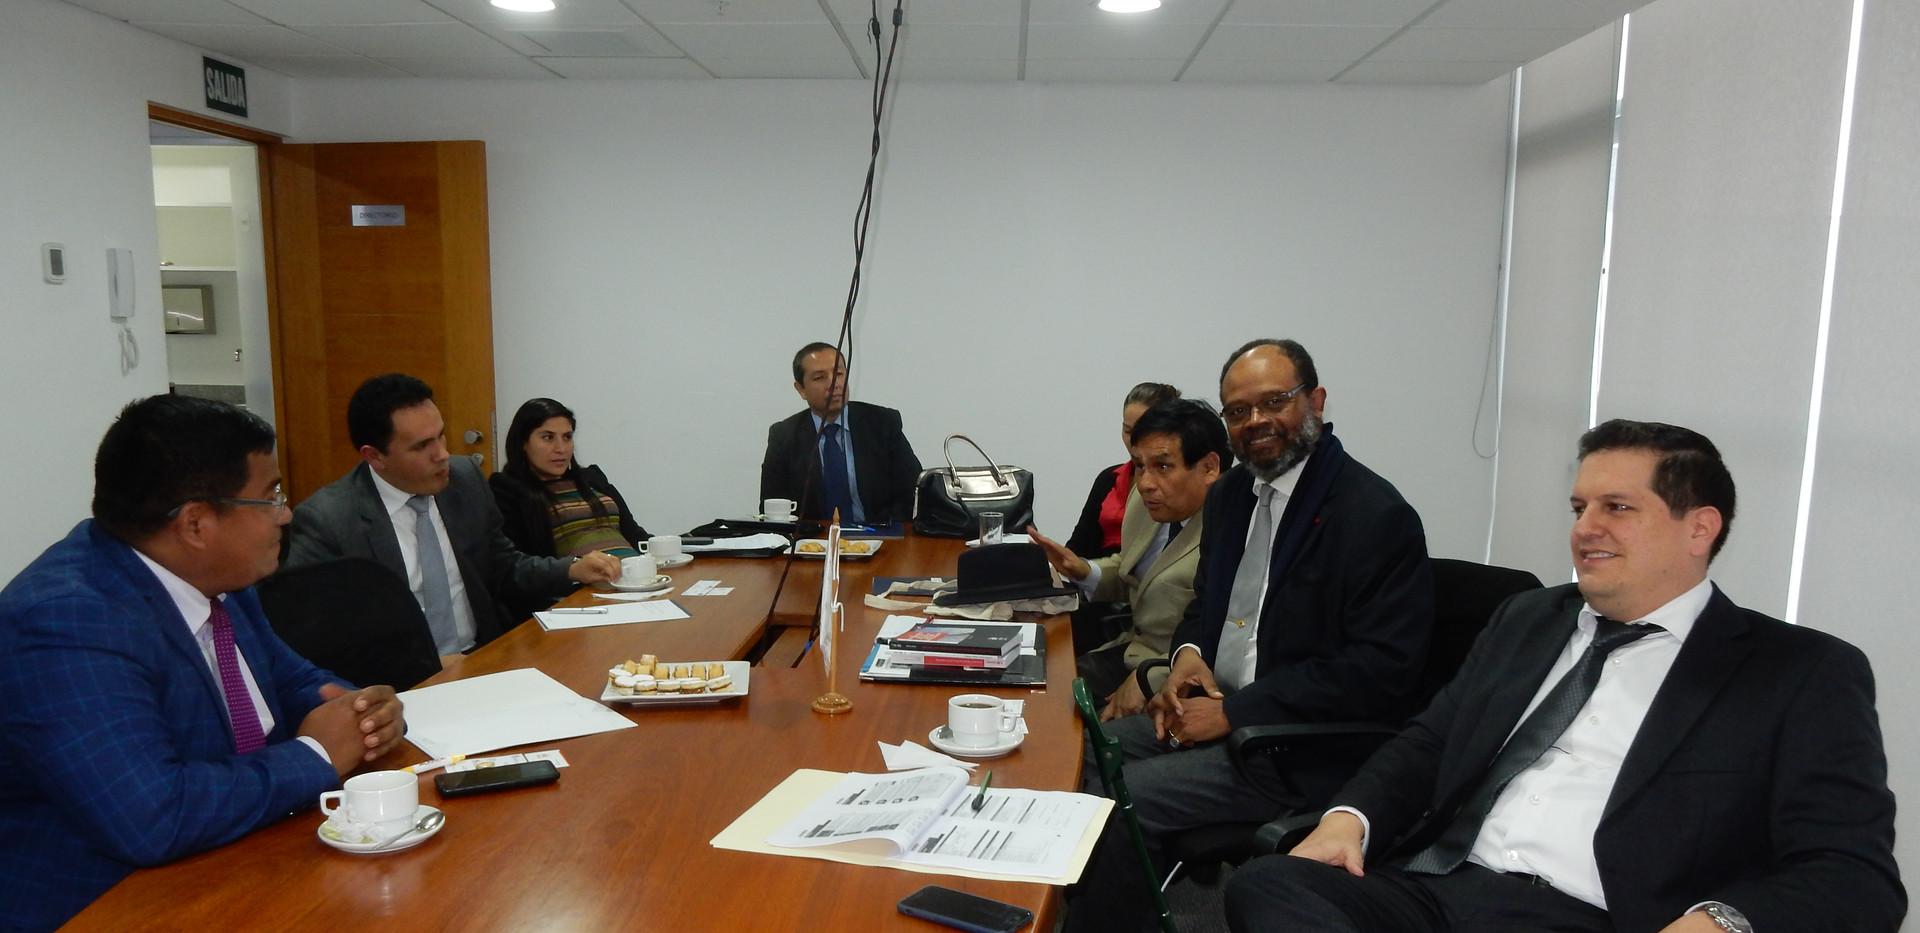 Alcander - Dept. Legal - Cámara de Bélgica & Luxemburgo invitada Cámara de Rumania